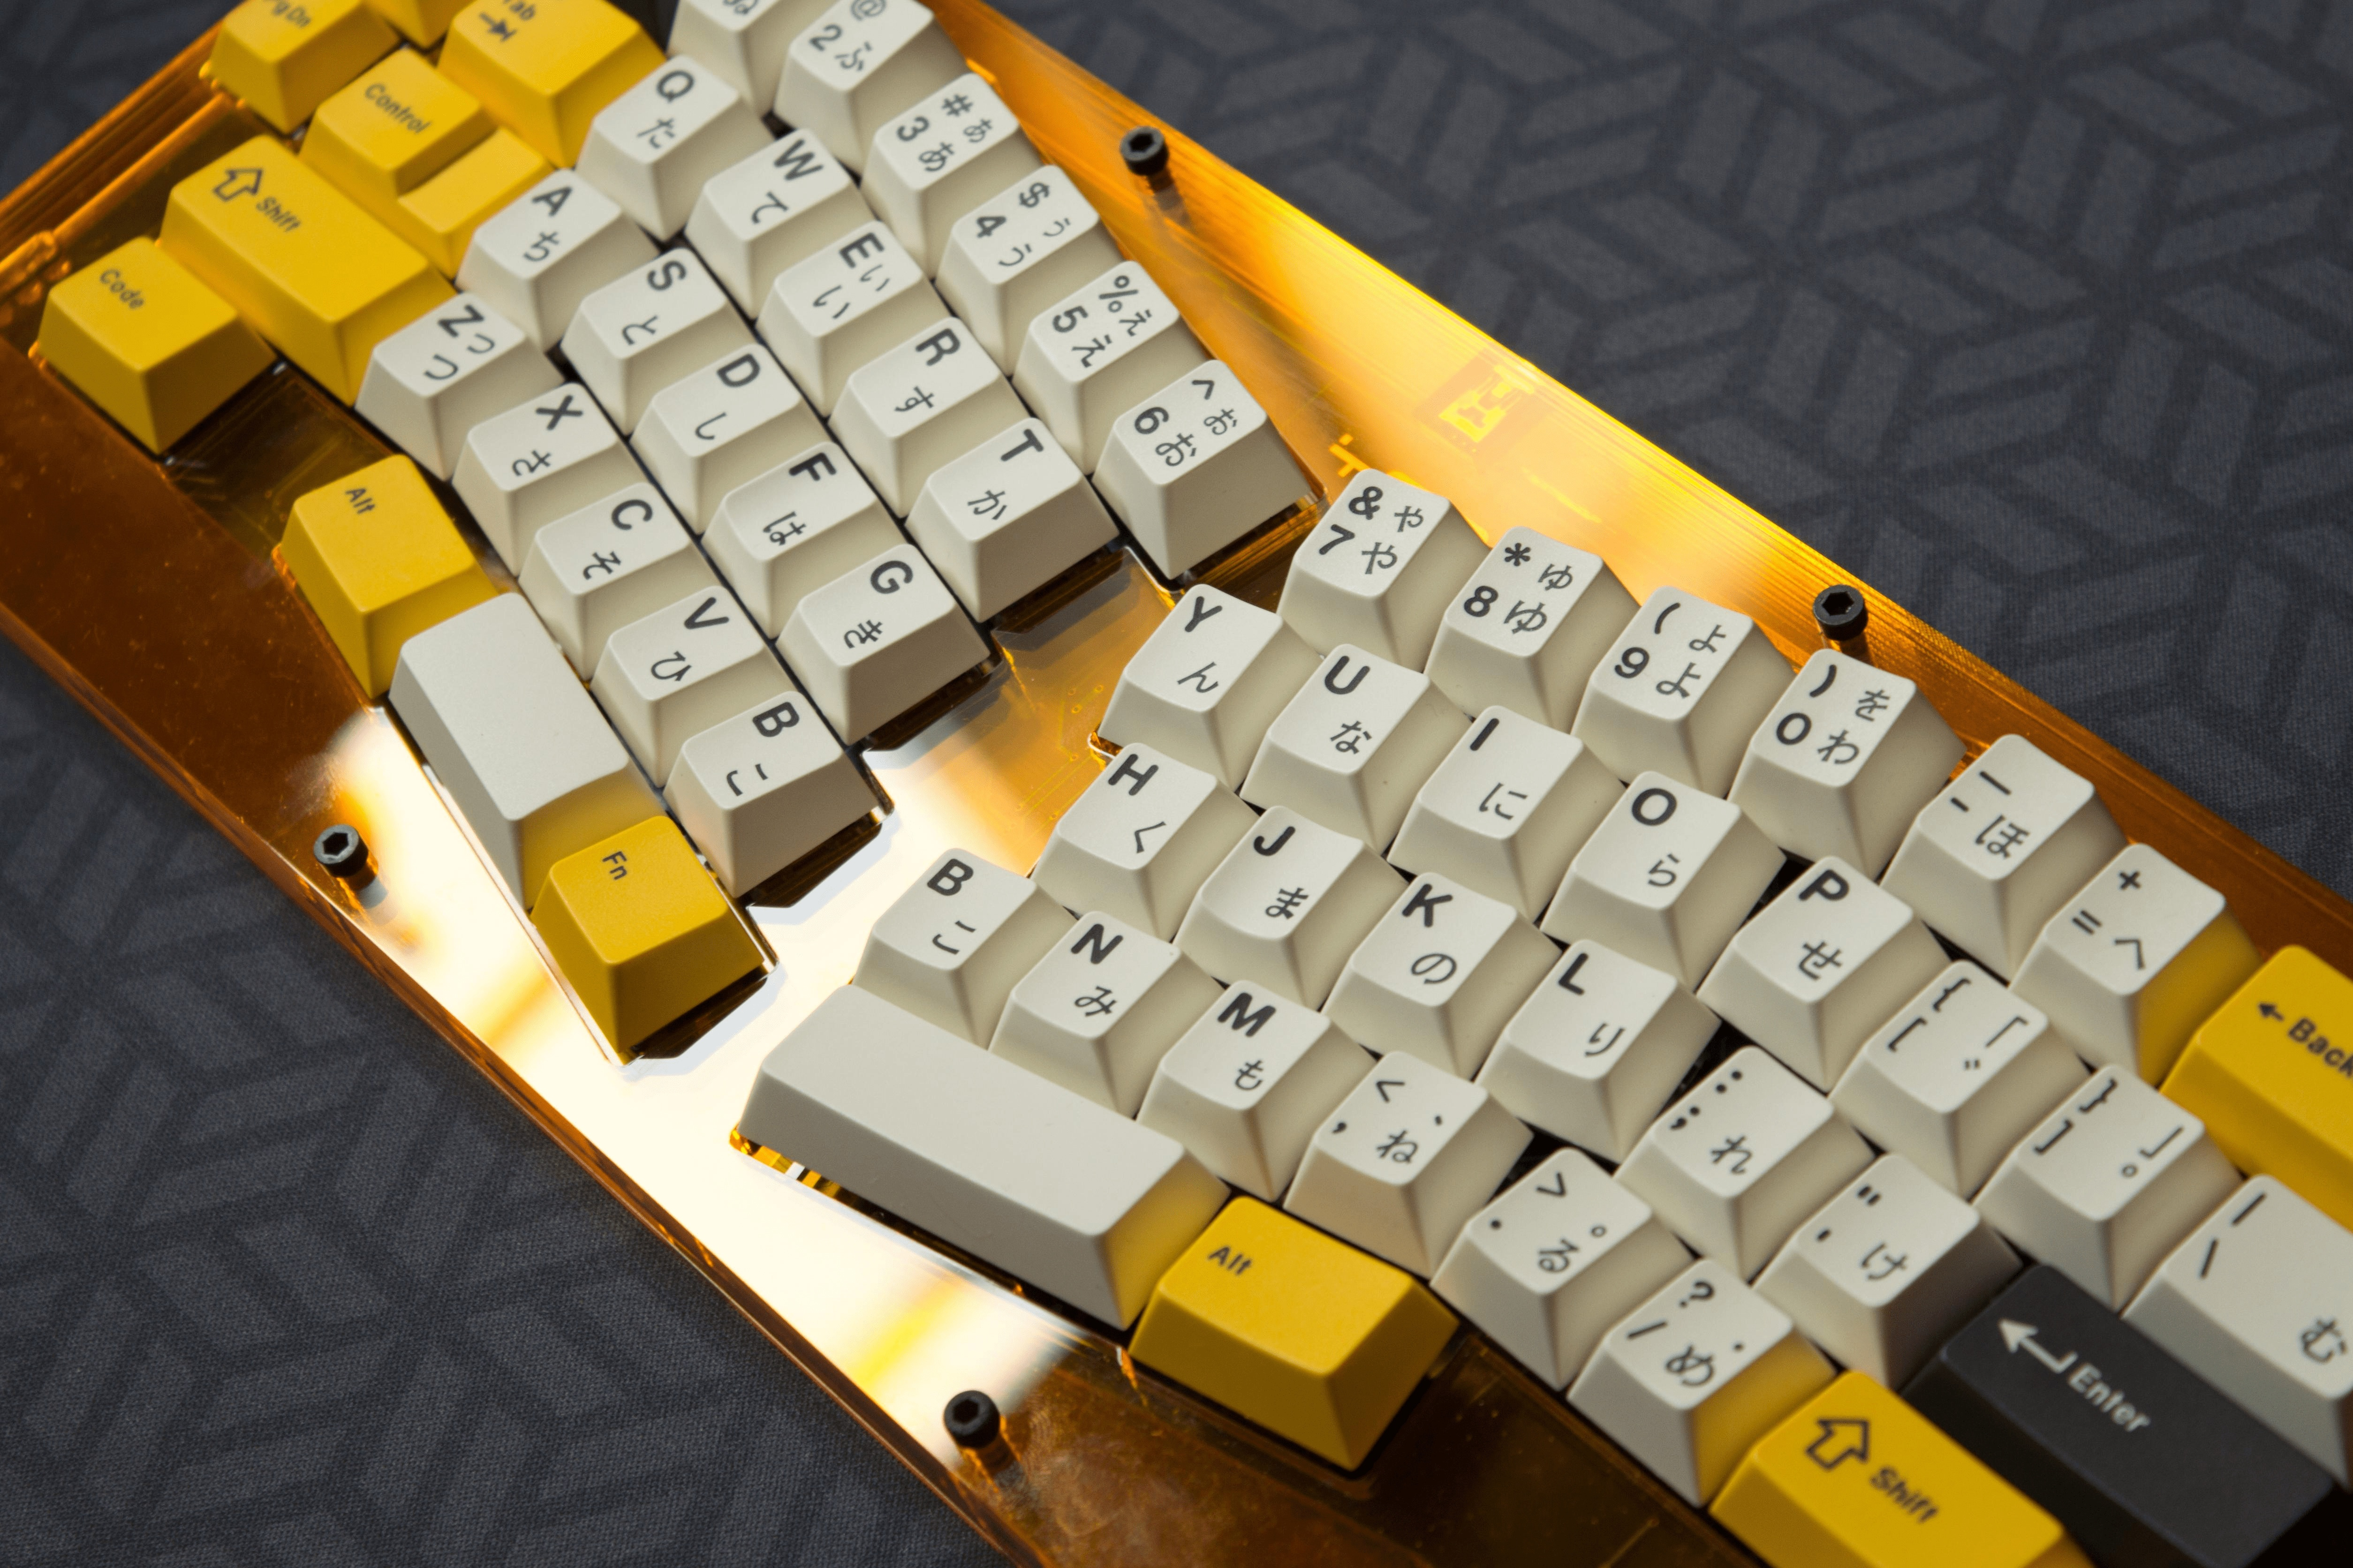 A split staggered keyboard